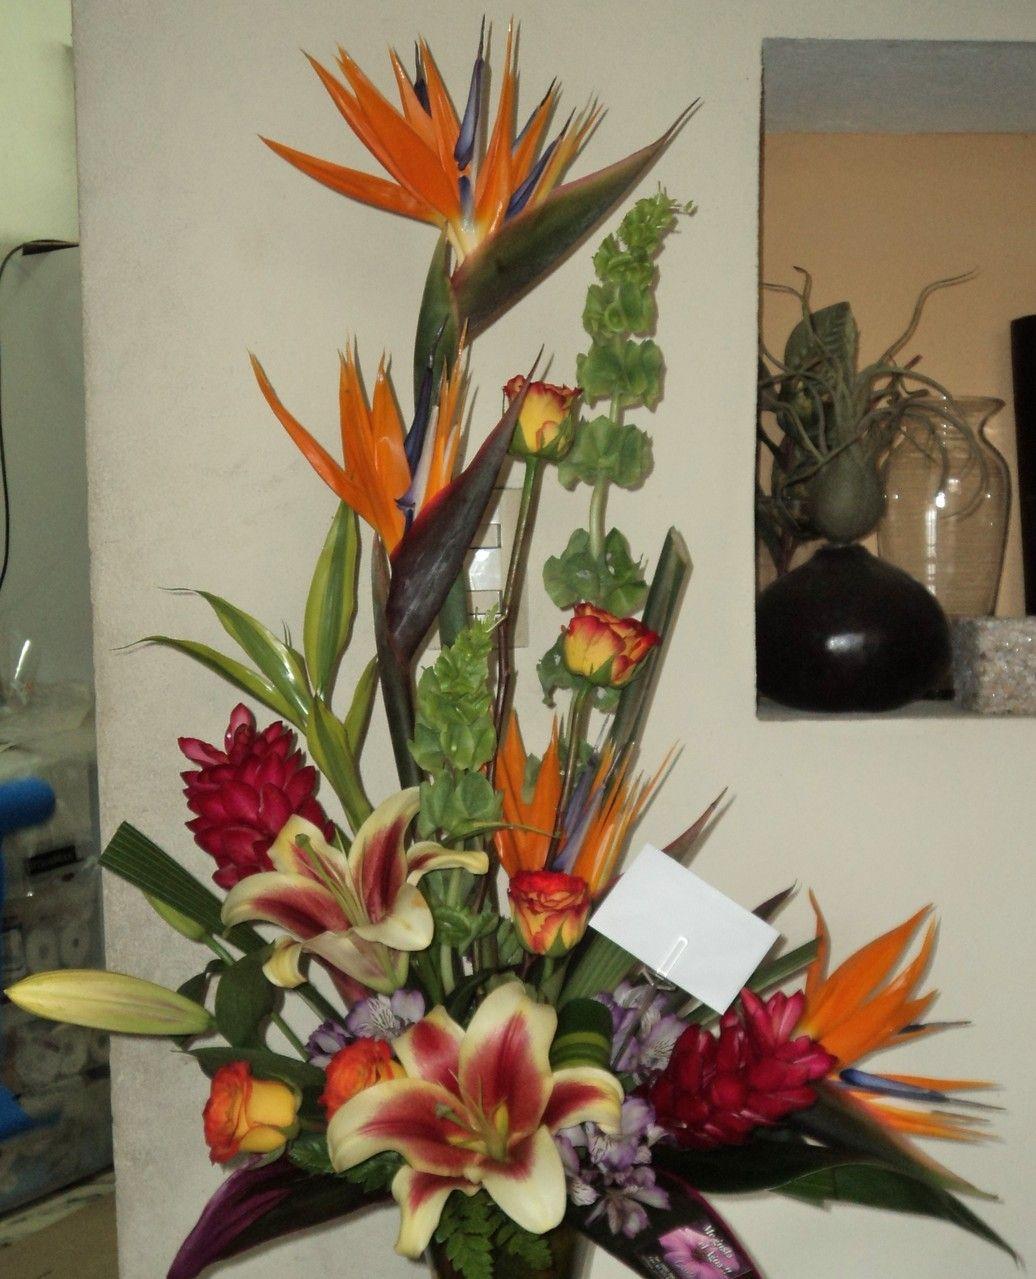 Detalles Florales Floreria Cattleya En Nuevo Vallarta Cattleya Flower Shop Rose Flower Arrangements Valentine Flower Arrangements Ikebana Flower Arrangement